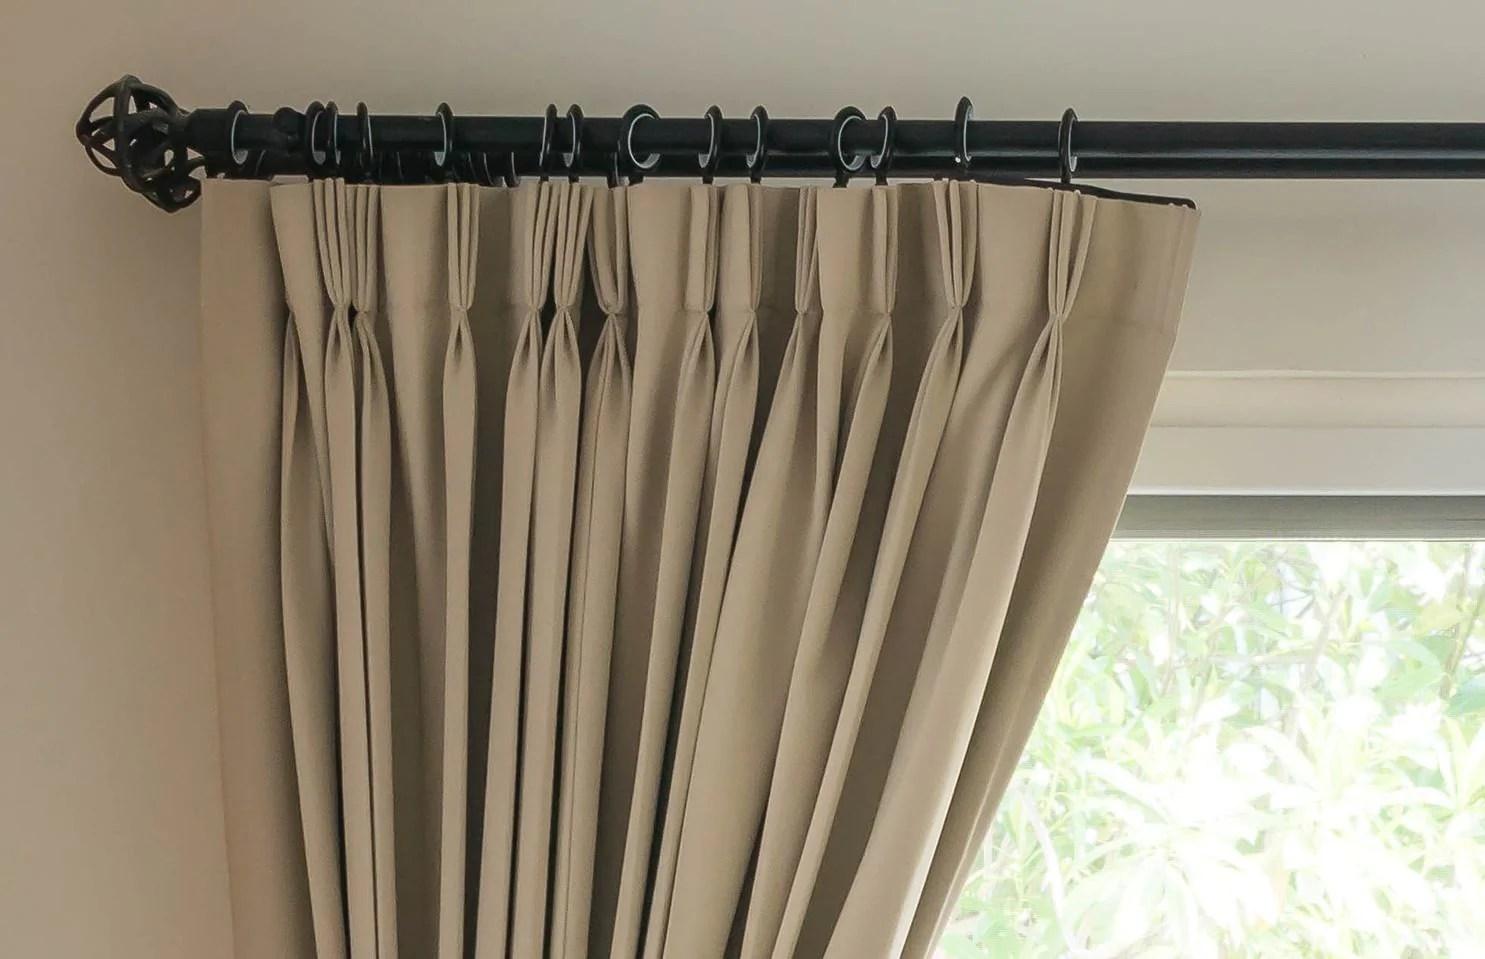 window do i fit my curtain pole